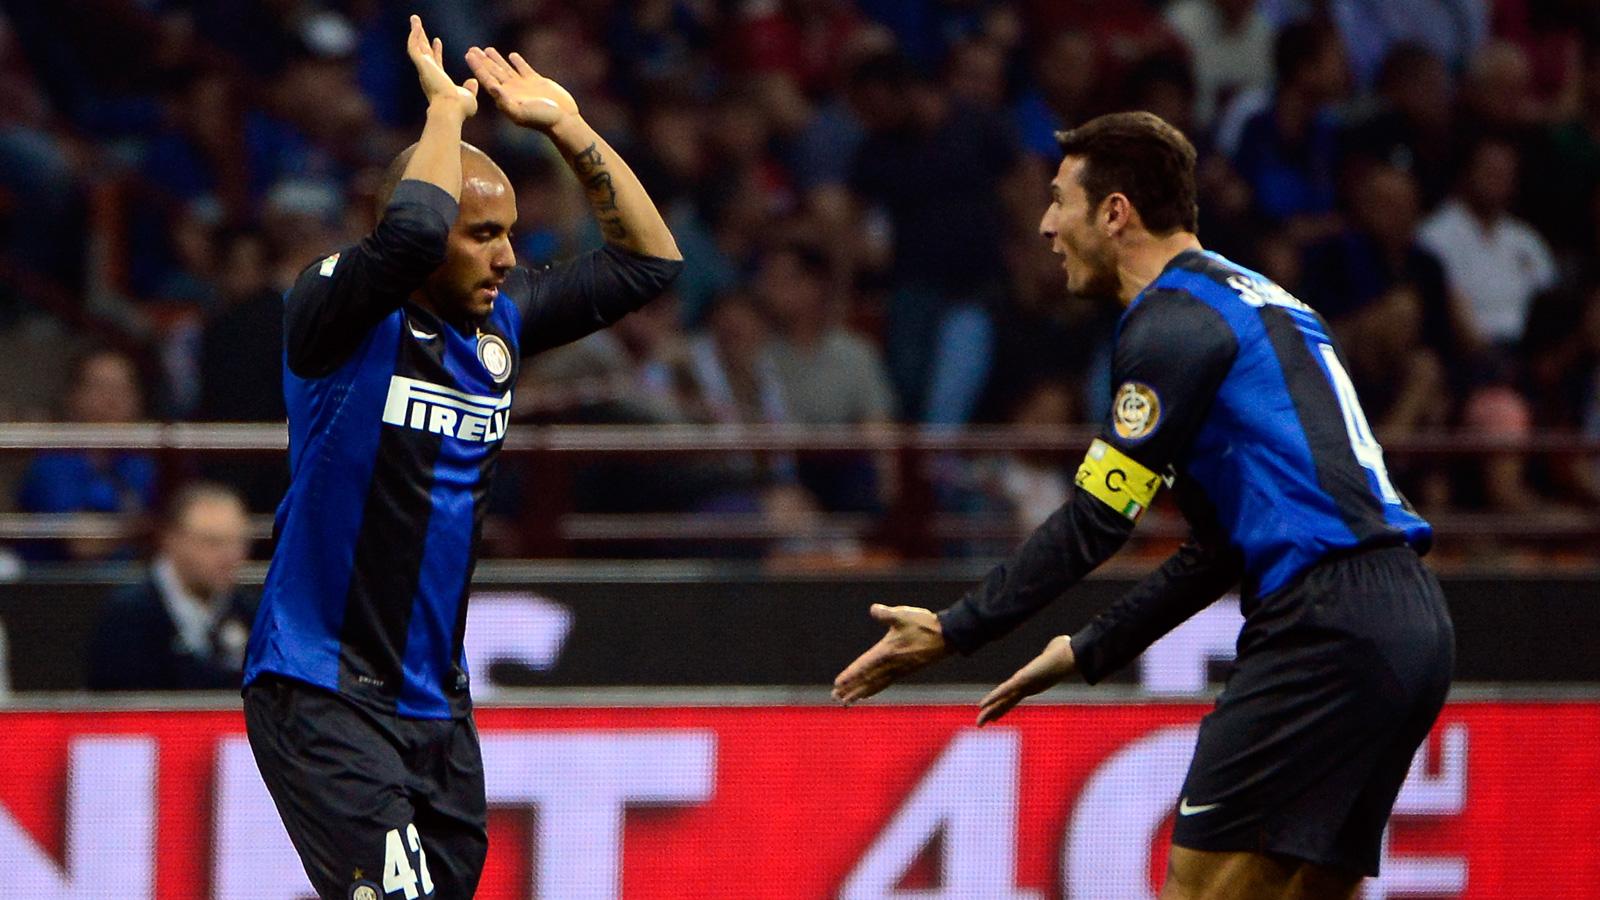 Inter Milan (Italy), 2013